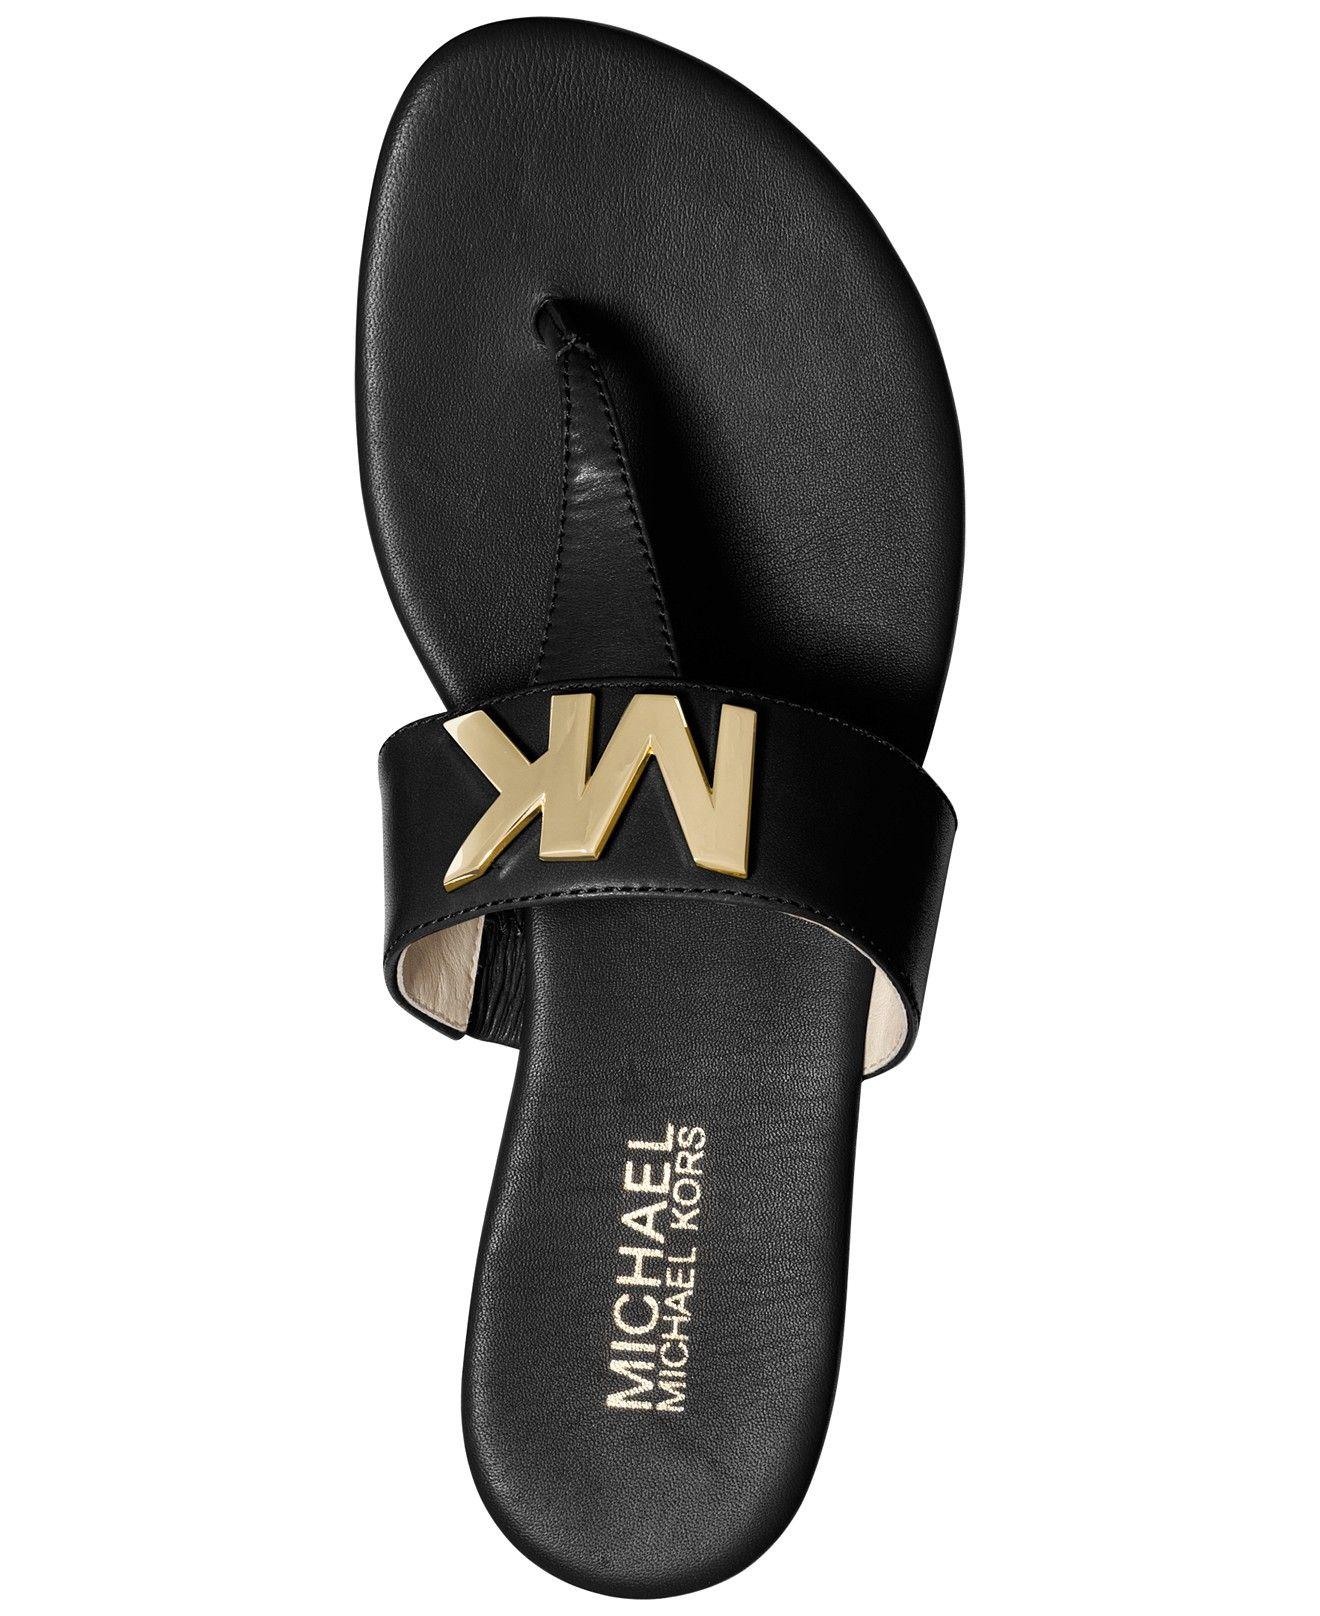 7d79c71db37f MICHAEL Michael Kors Hayley Thong Flat Sandals - Sandals - Shoes - Macy s